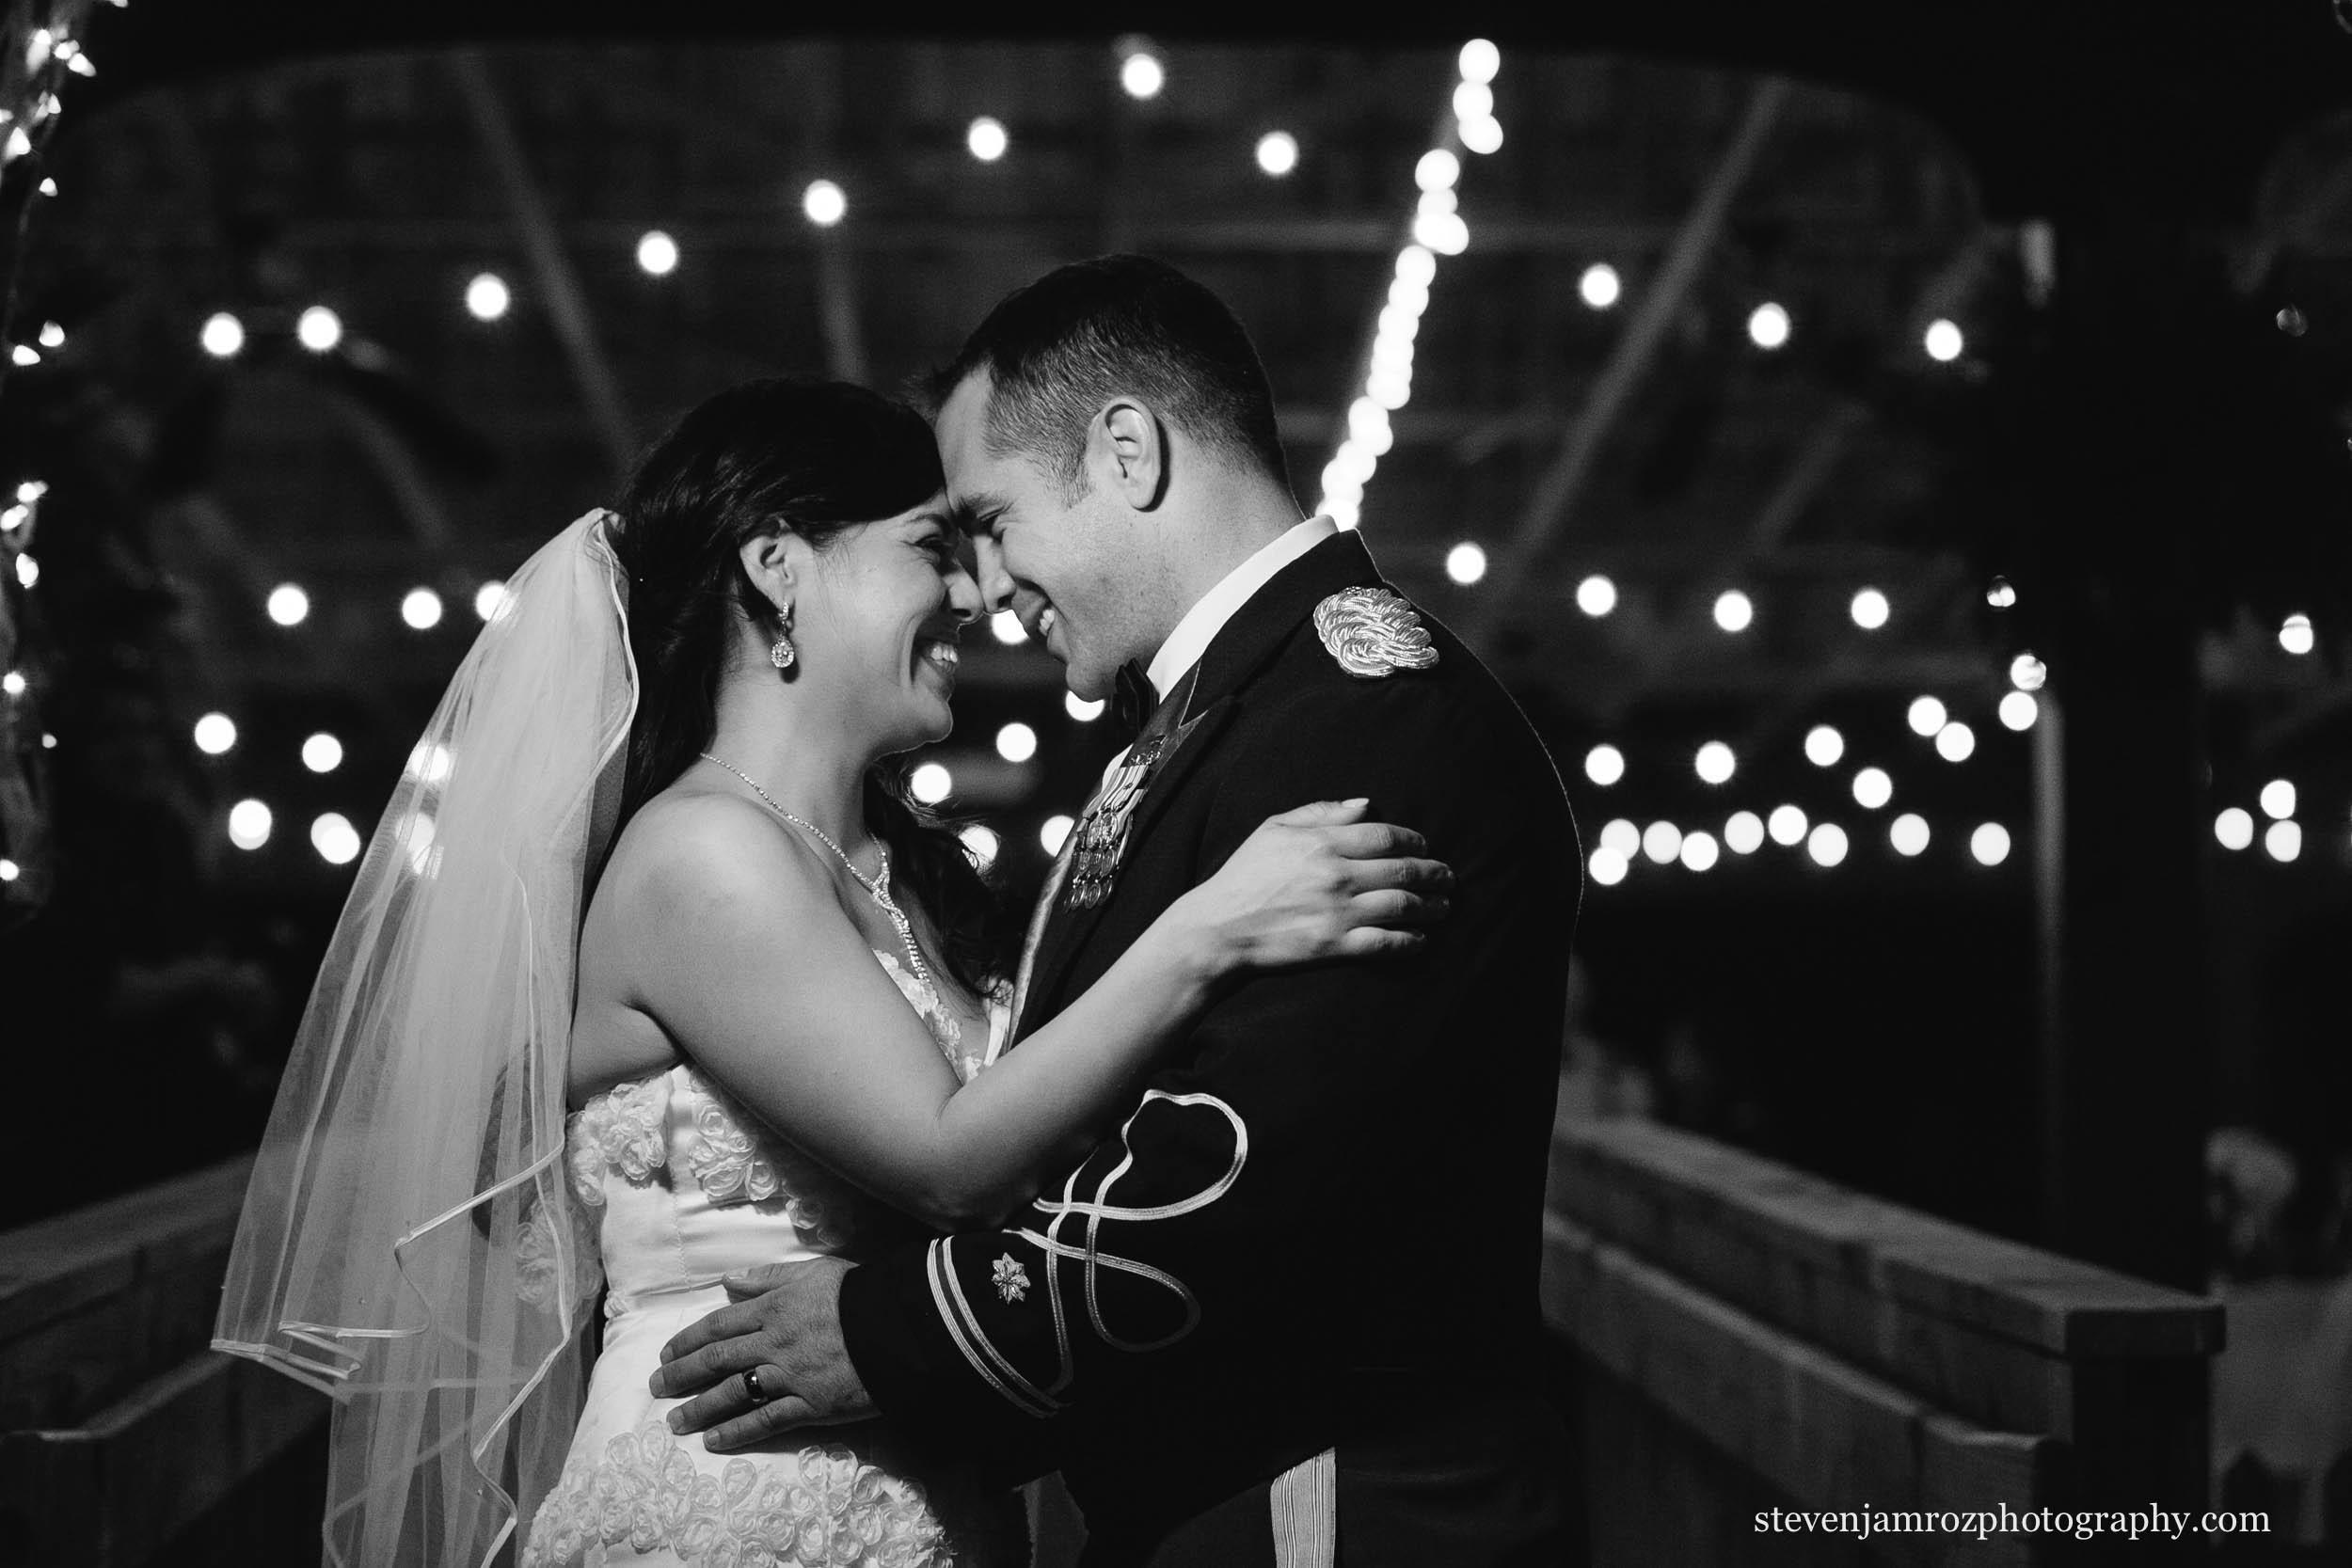 night-portrait-wedding-steven-jamroz-photography-0248.jpg